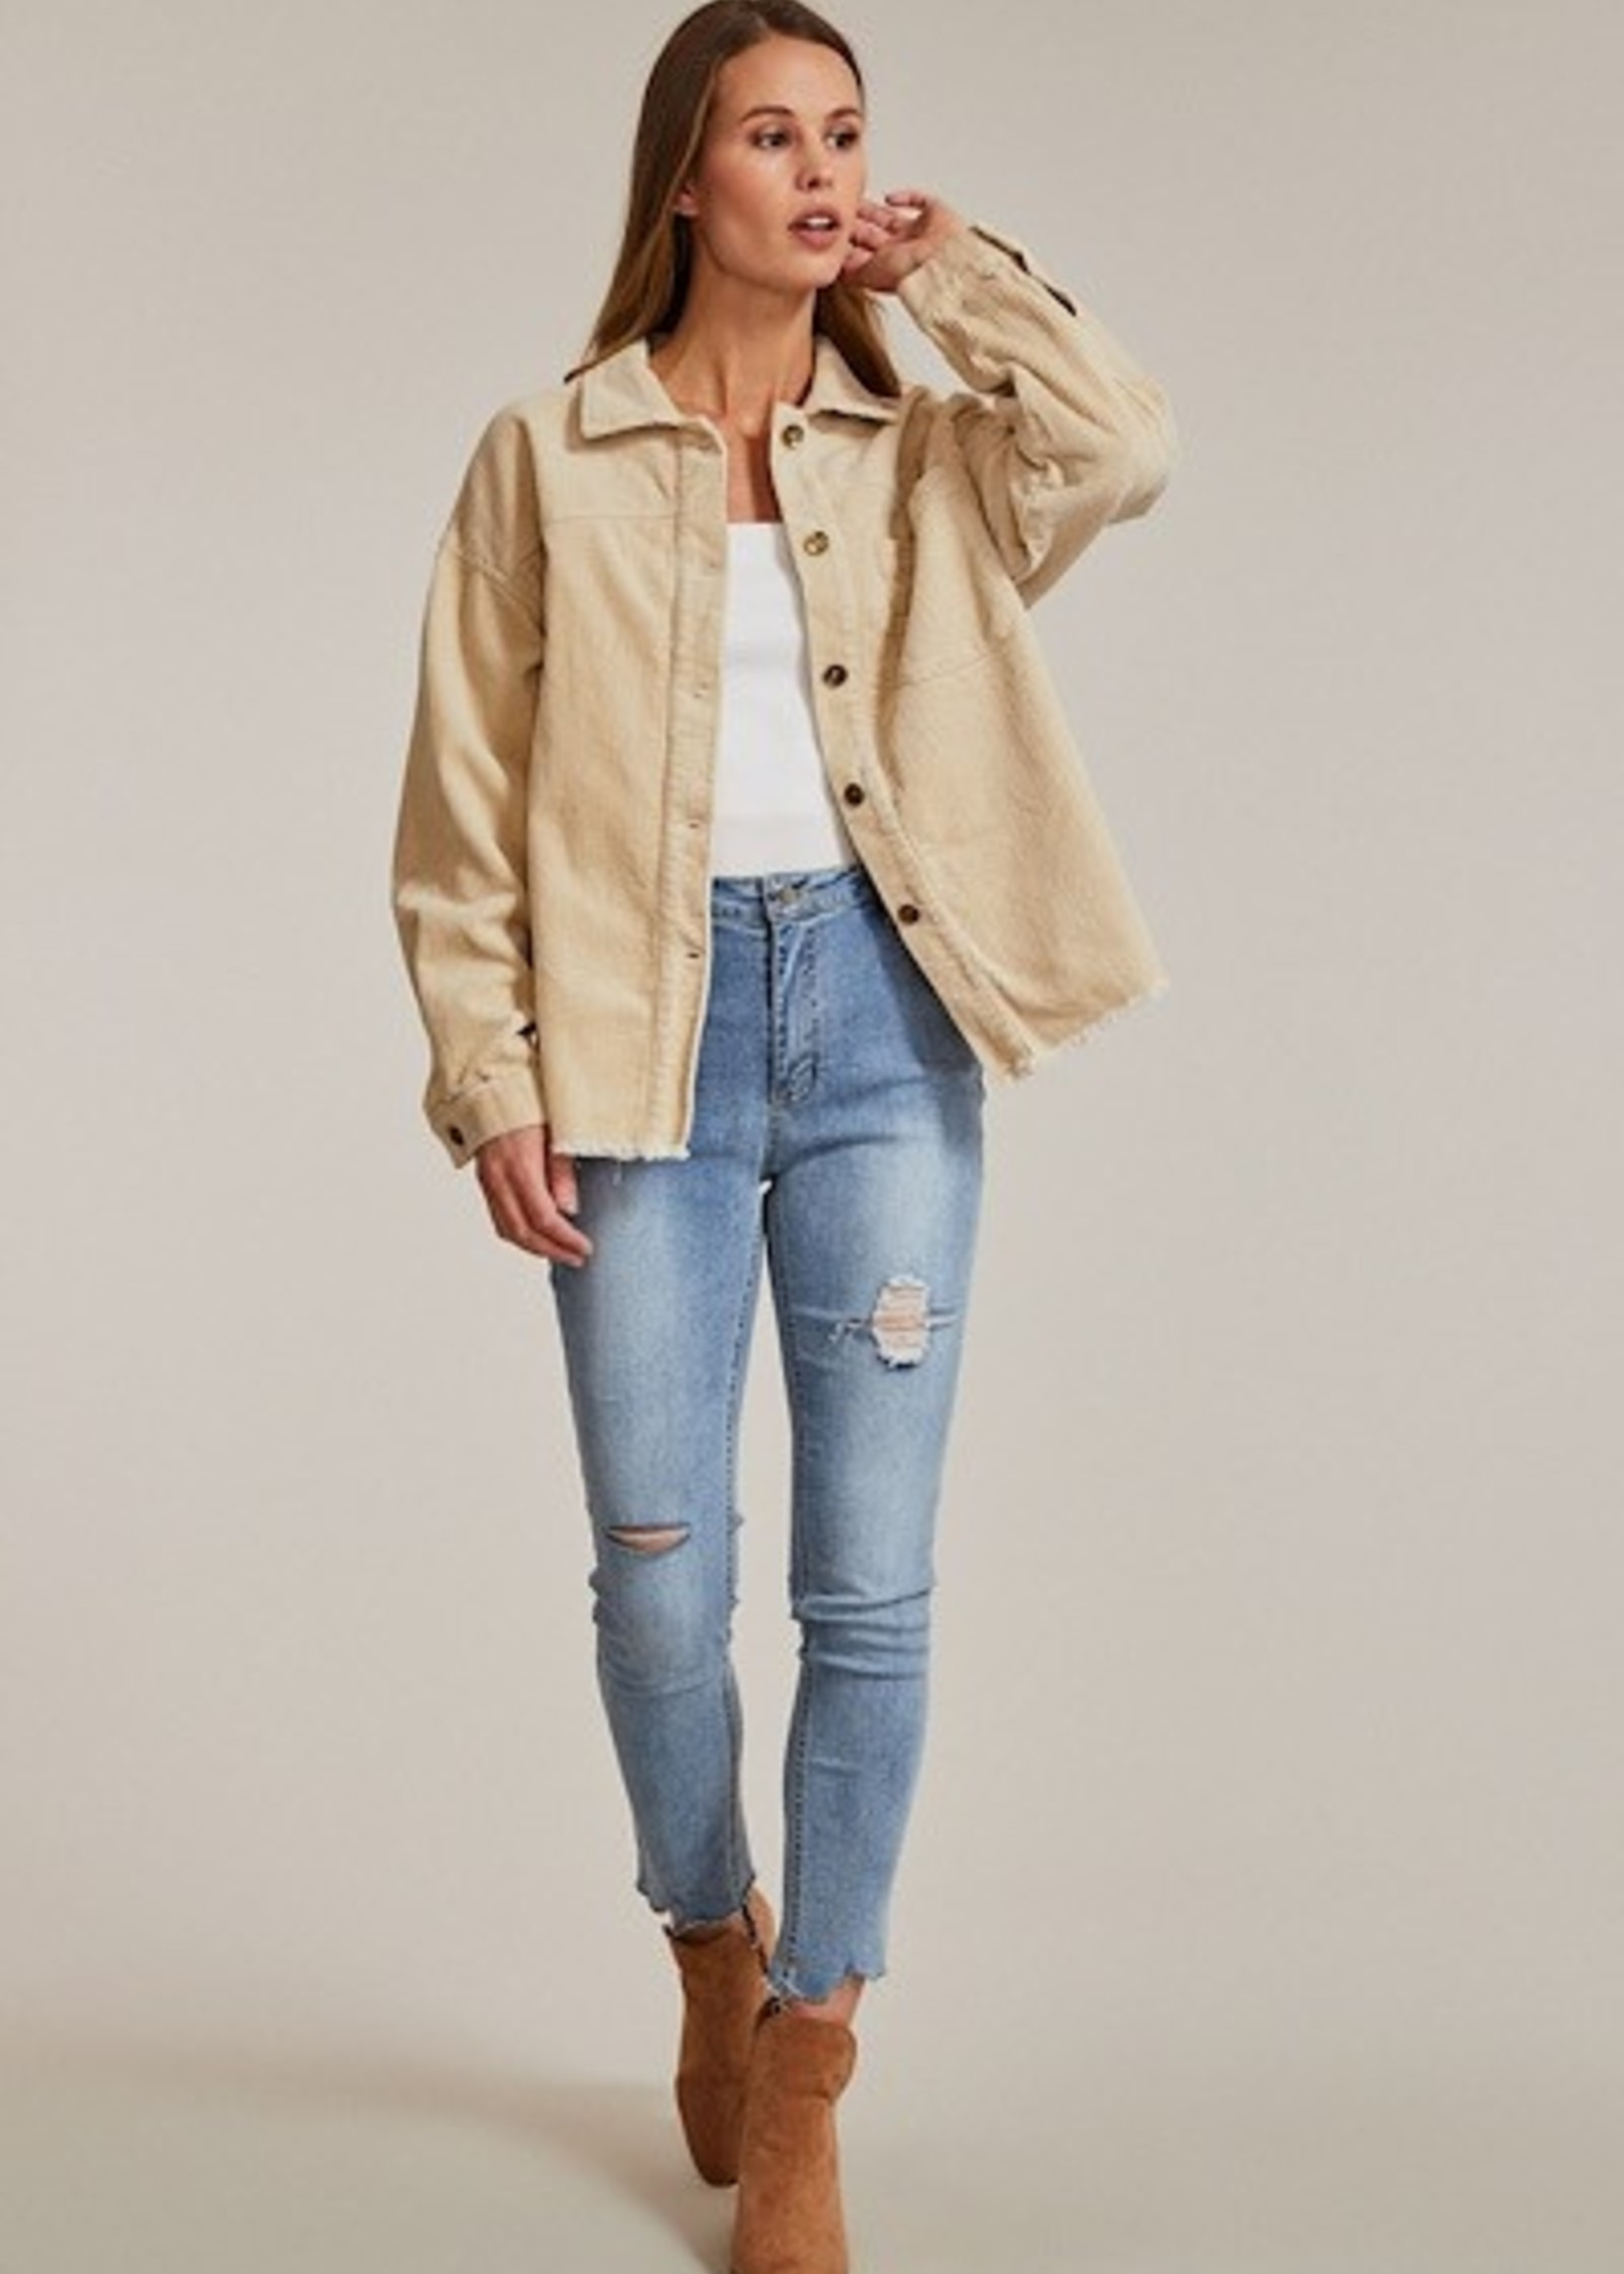 Cord Jacket - Beige